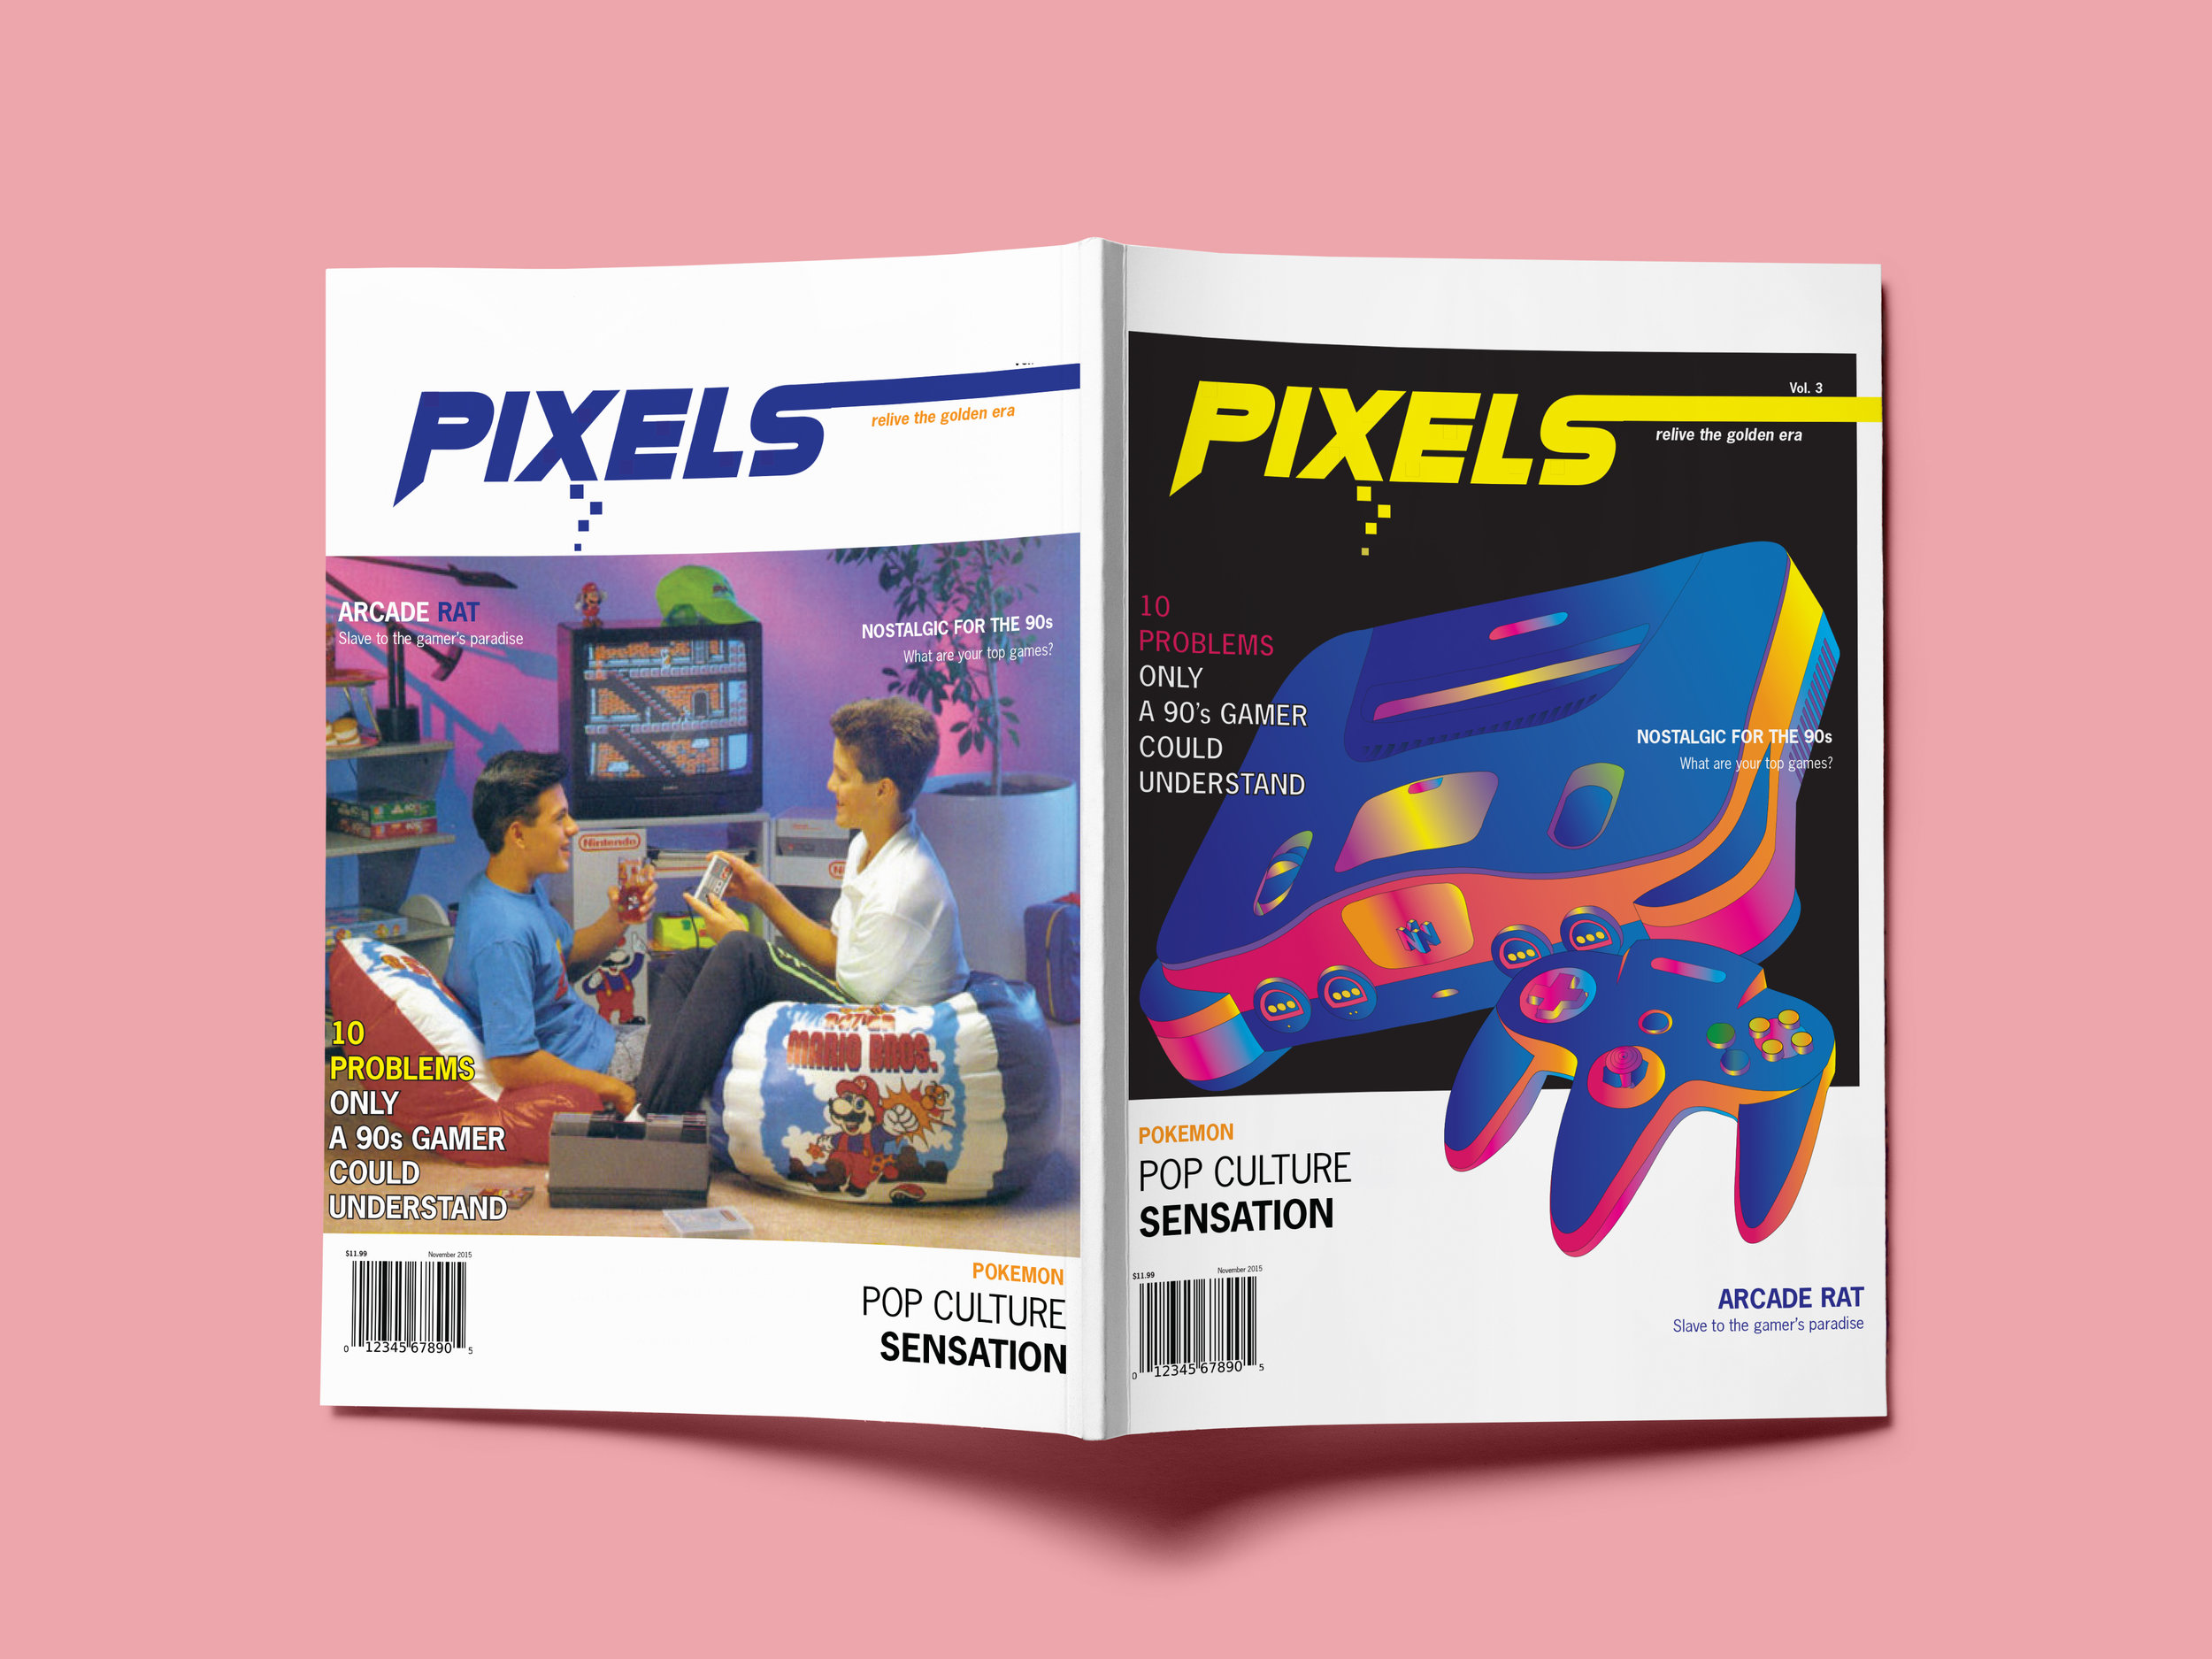 pixels-bothcovers.jpg